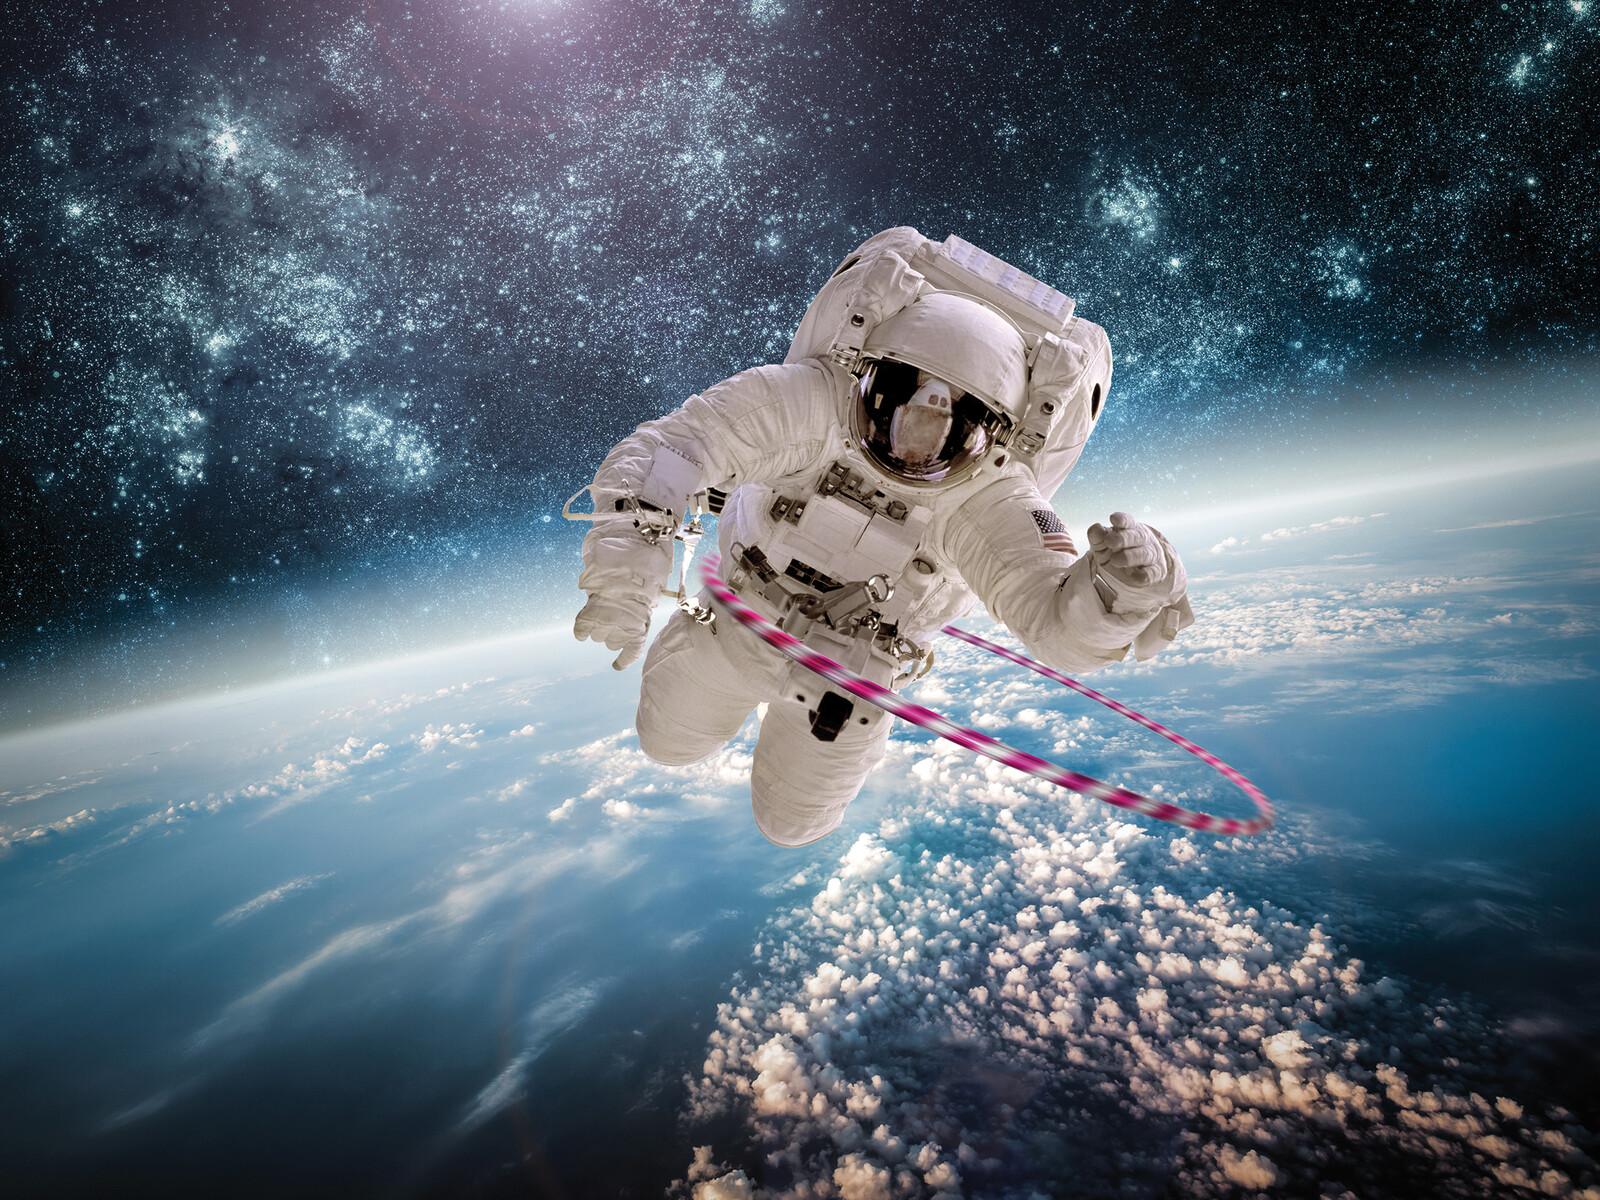 Astronaut - Jirko Bannas